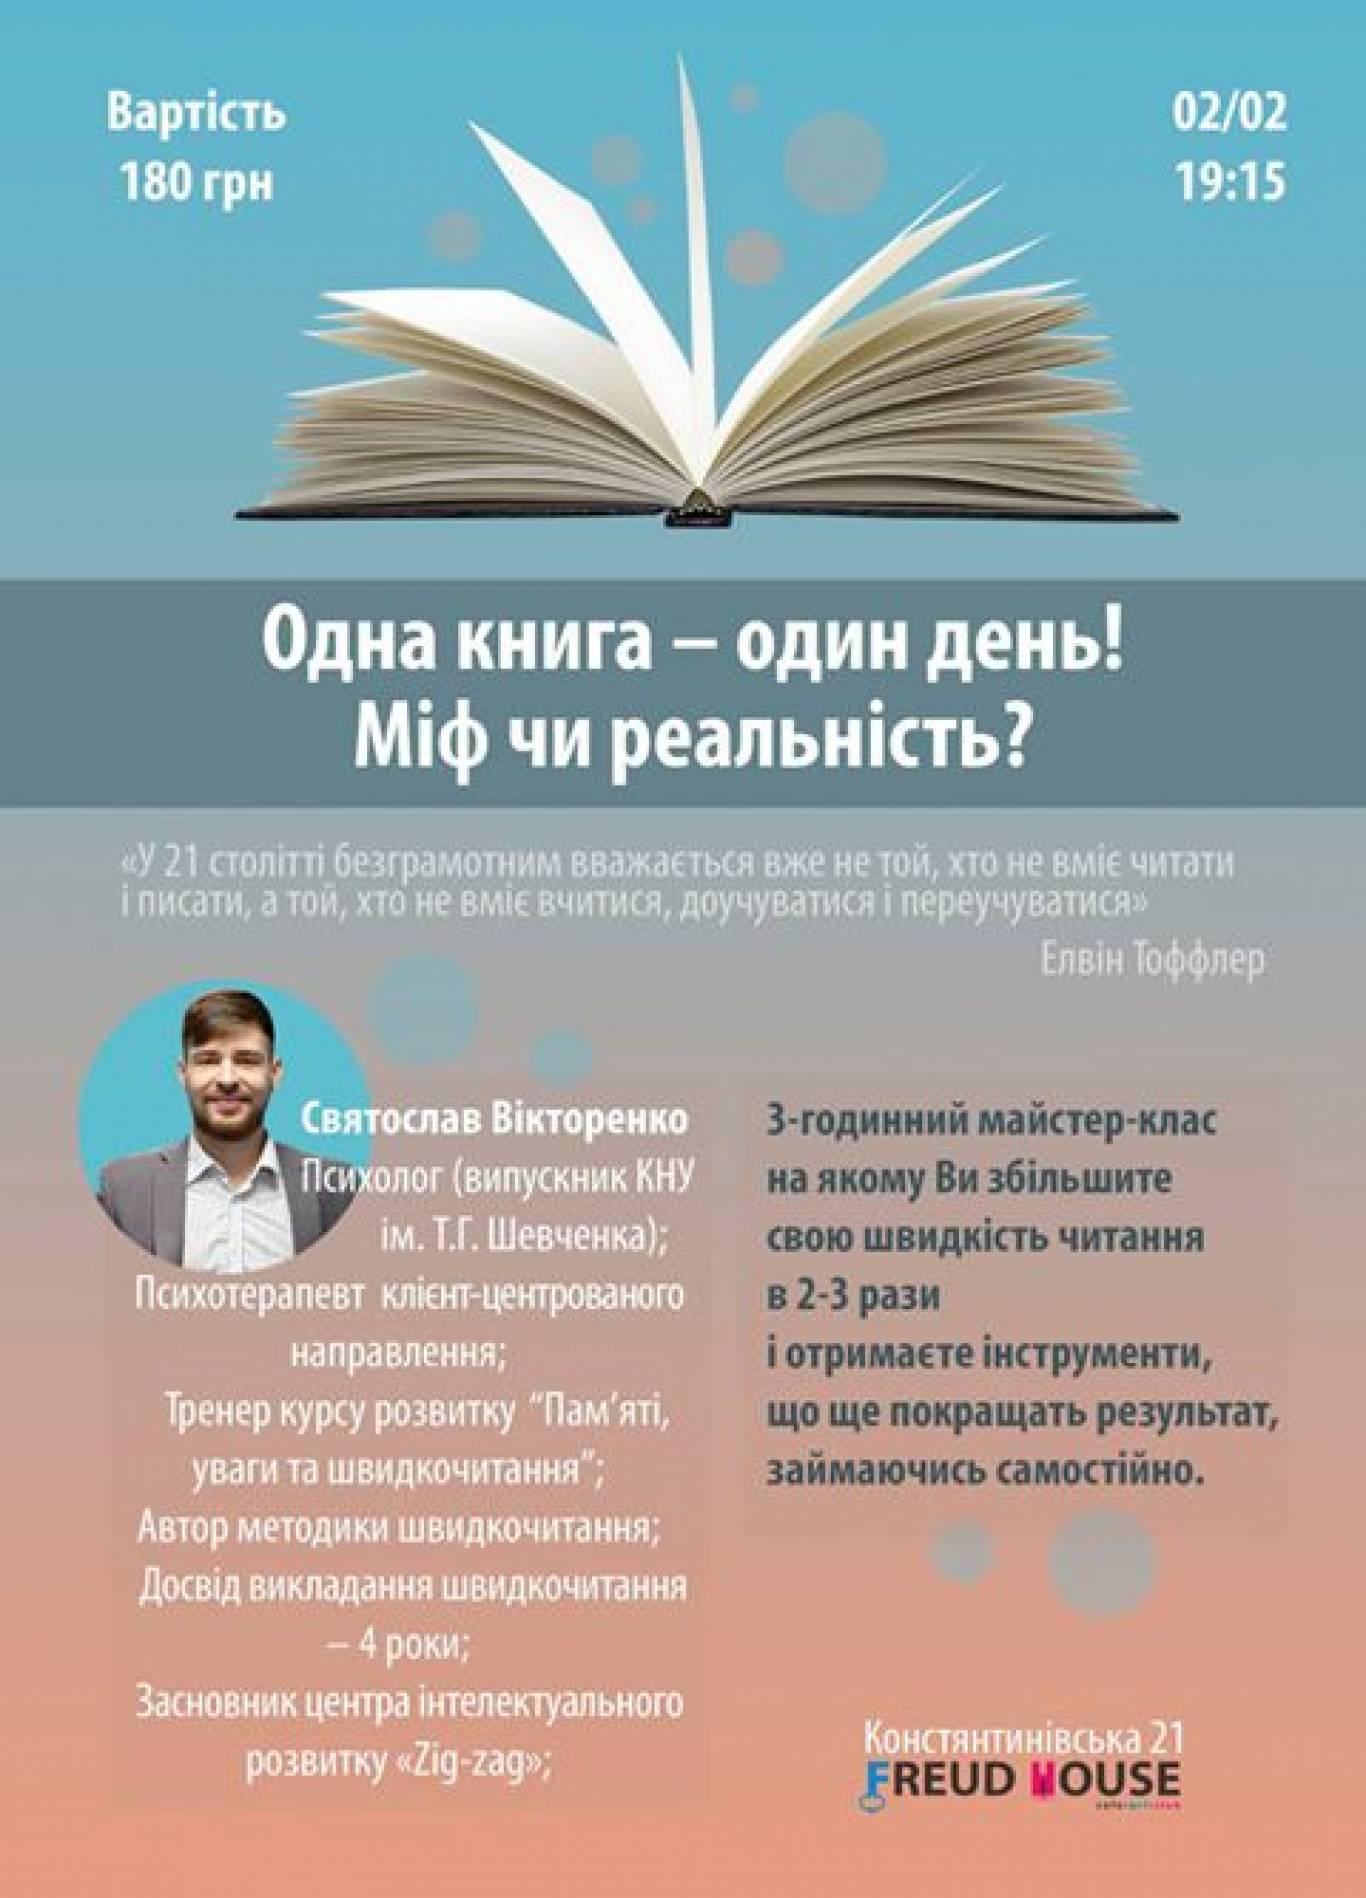 Одна книга - один день! Міф чи реальність?